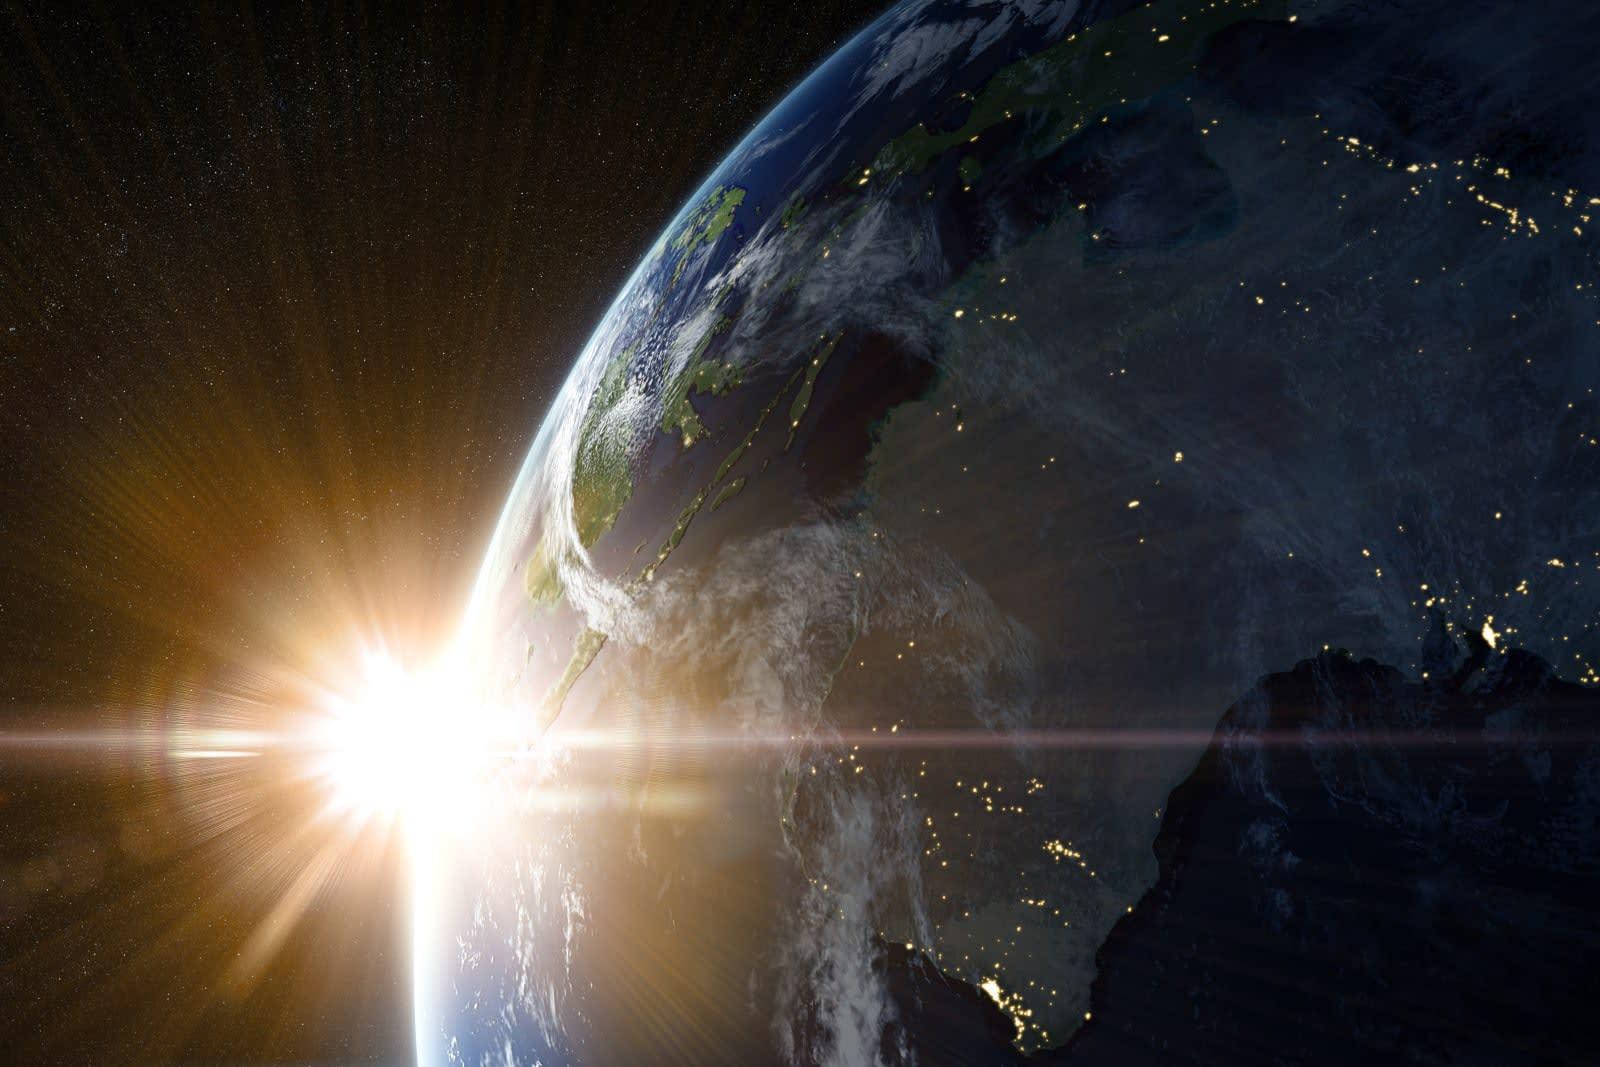 Amazon asks FCC for permission to launch internet satellites